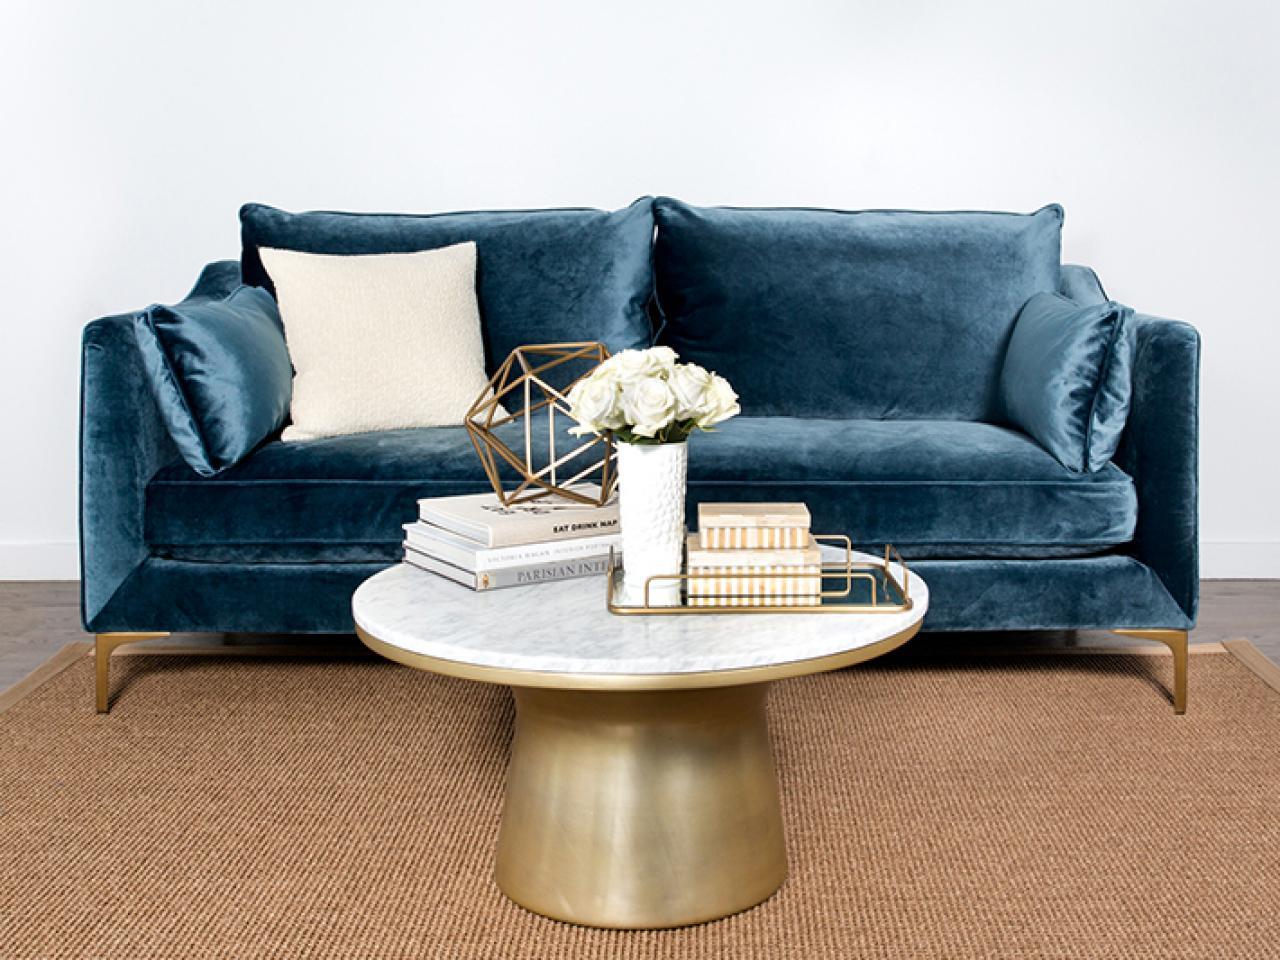 Velvet sofas 4. blue with gold accents UFXYXGD